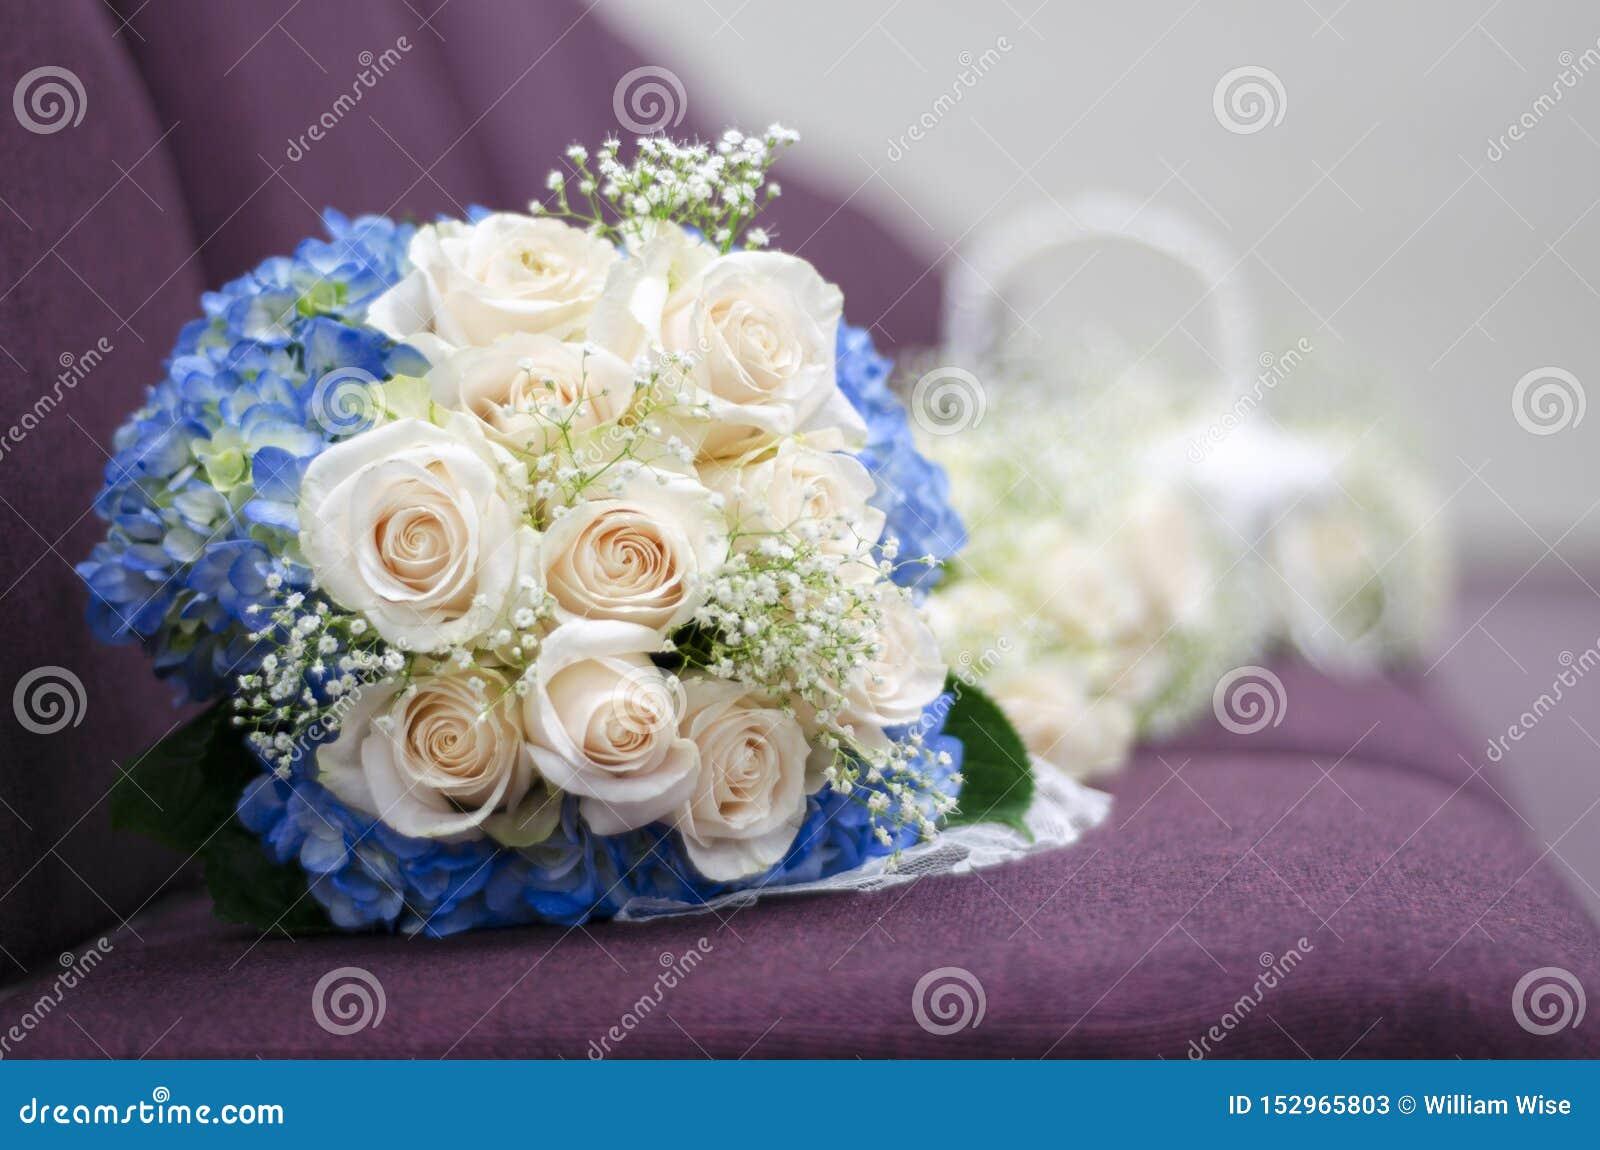 Wedding Bouquet Arrangement Rose Flowers Stock Image Image Of Boquet Arrangement 152965803